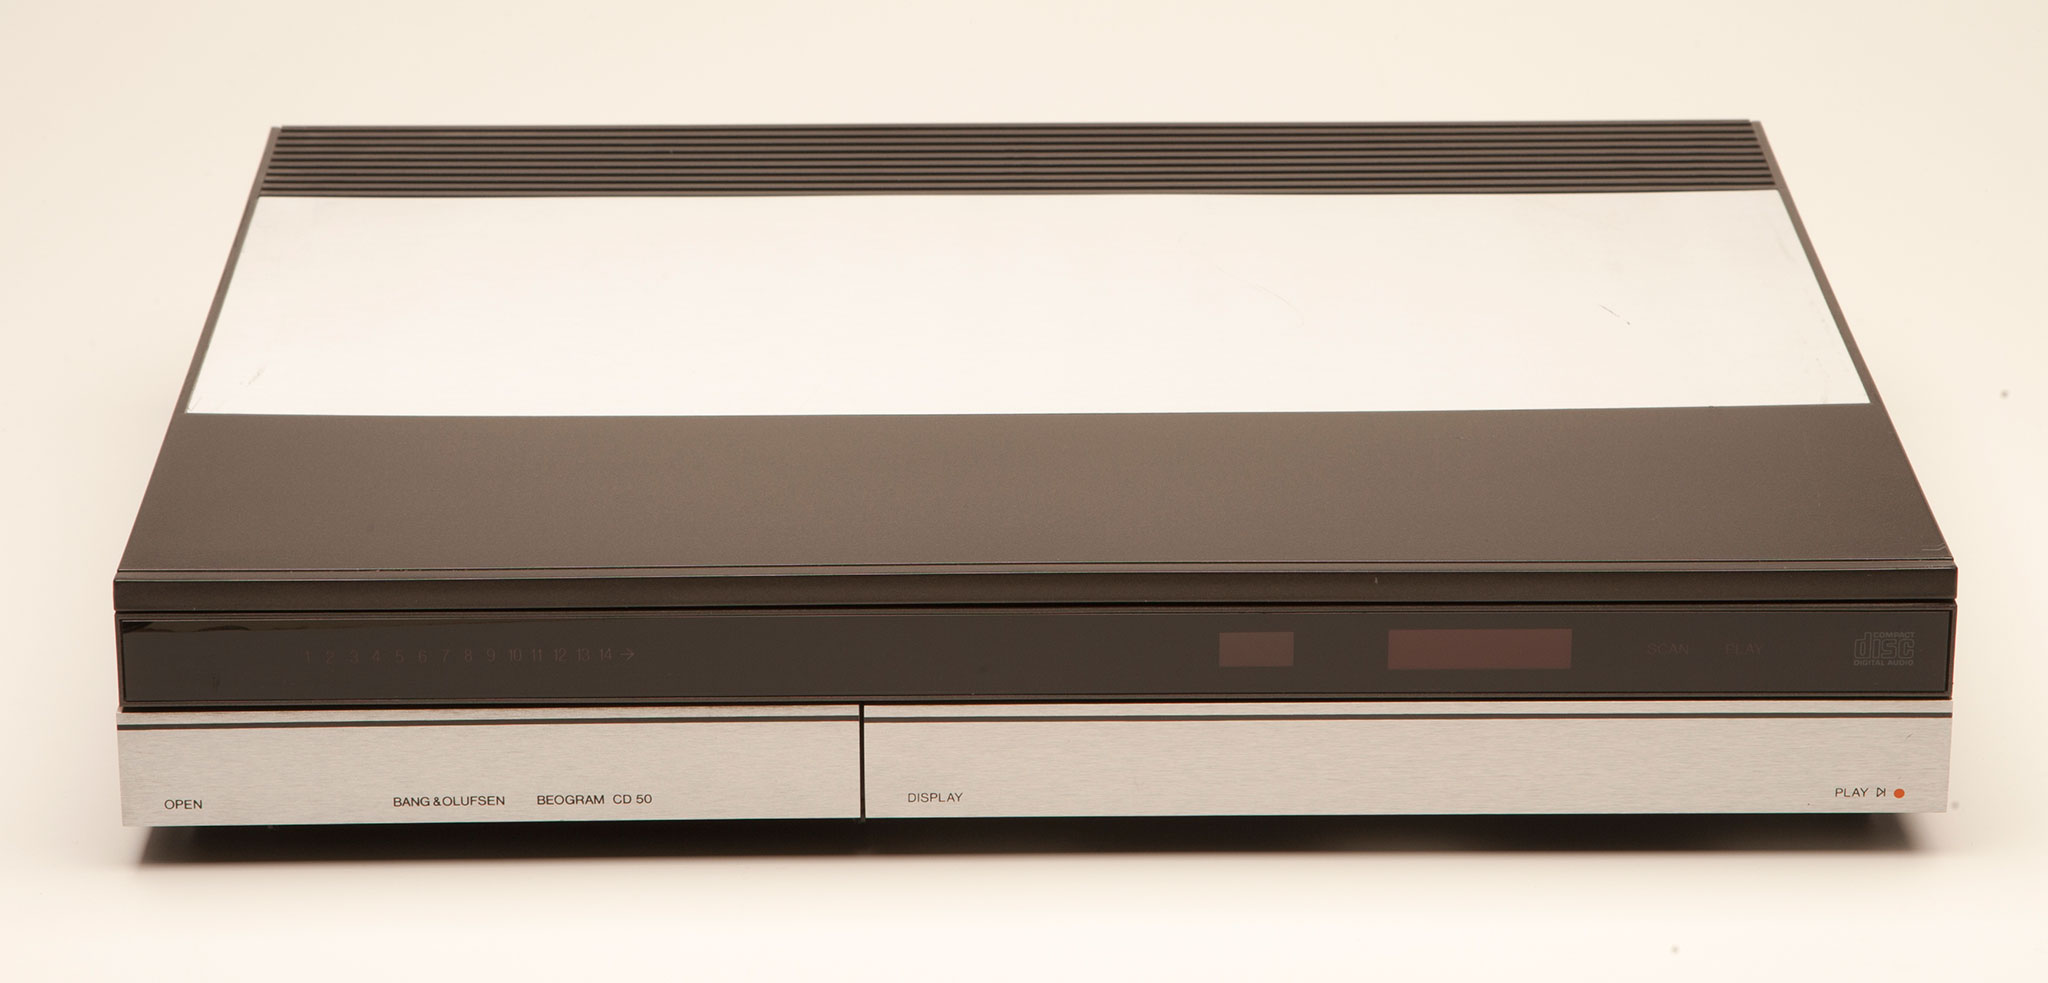 bang olufsen beogram cd50 compact disc player ebay. Black Bedroom Furniture Sets. Home Design Ideas